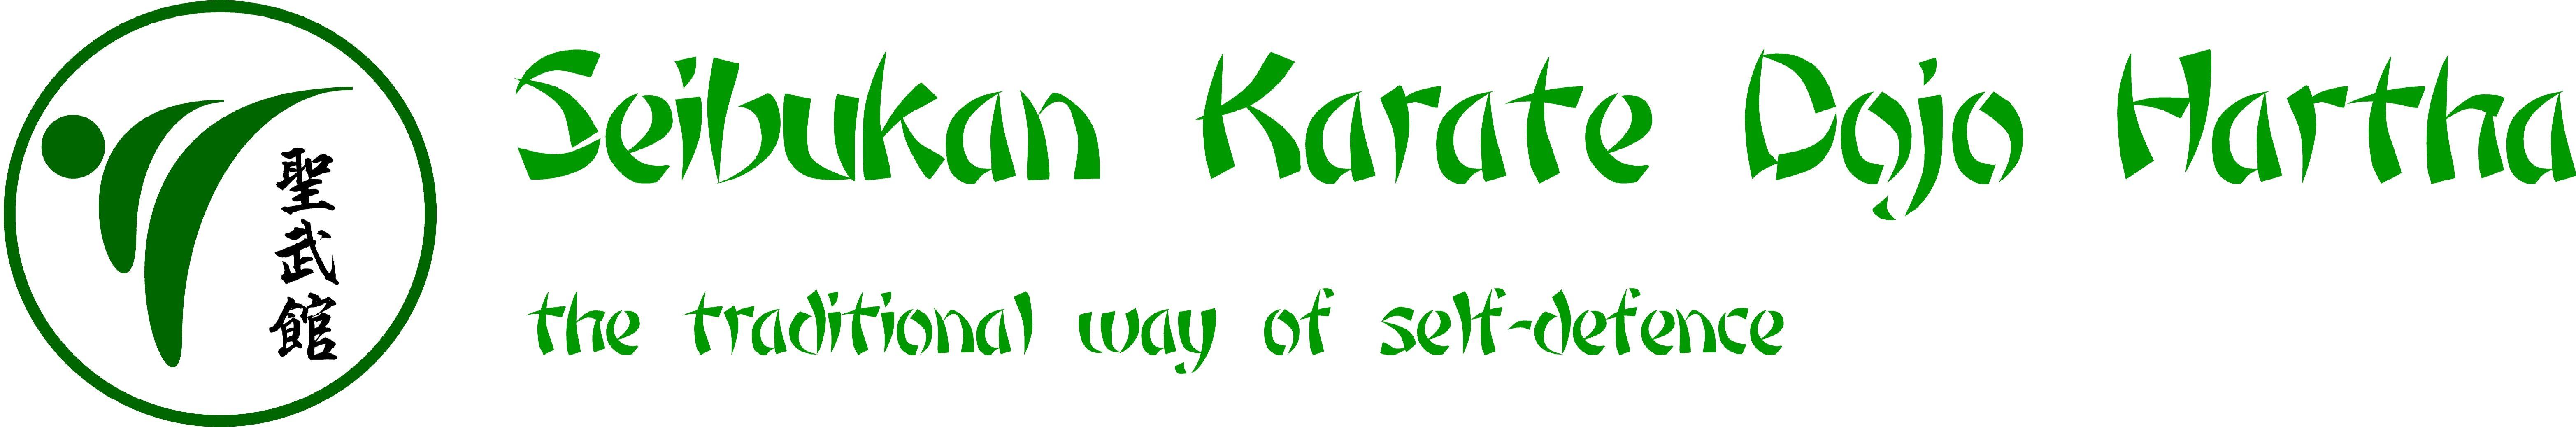 Seibukan Karate Dojo Hartha